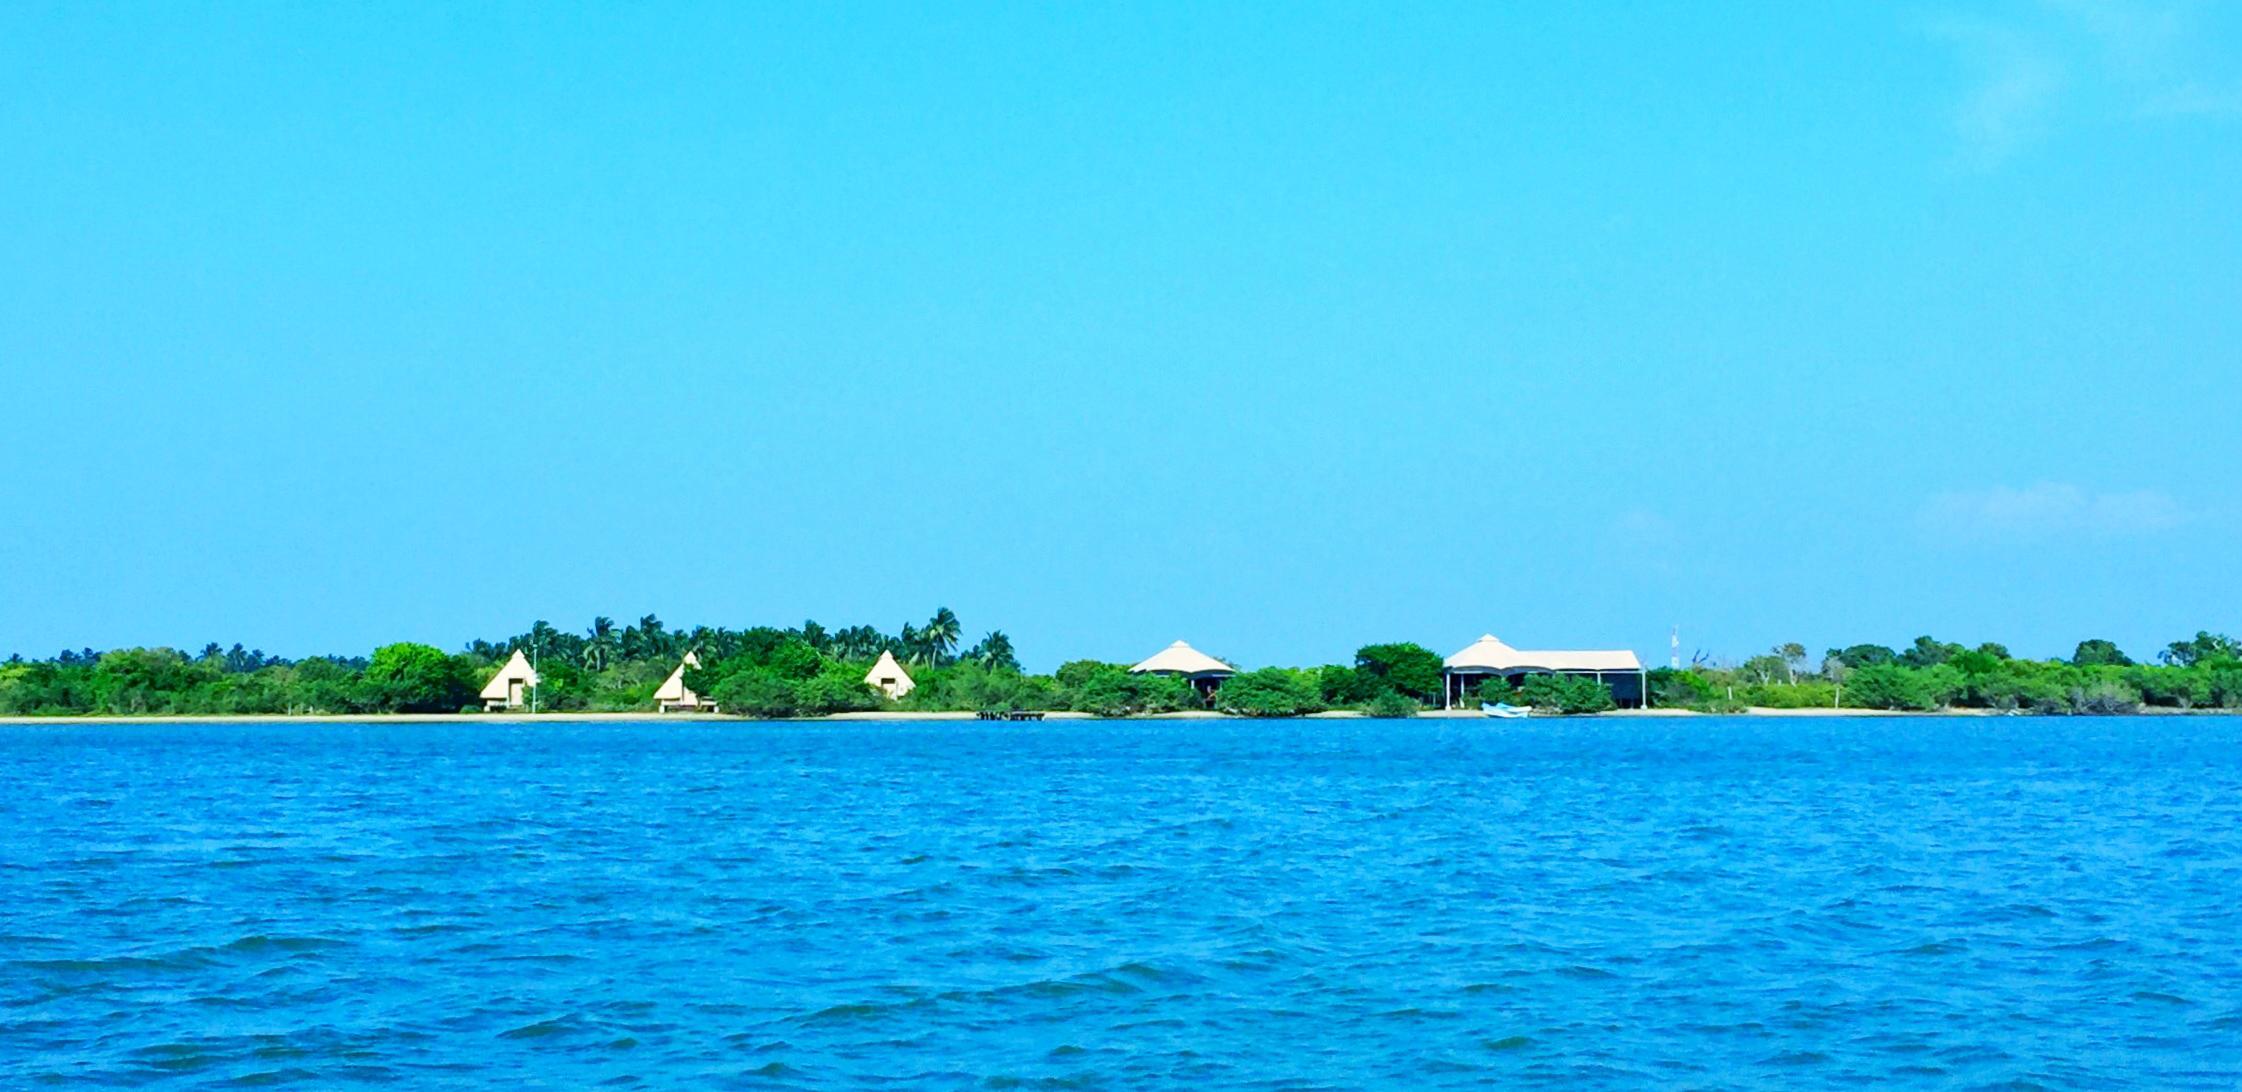 Kodev Kitesurfing Resort